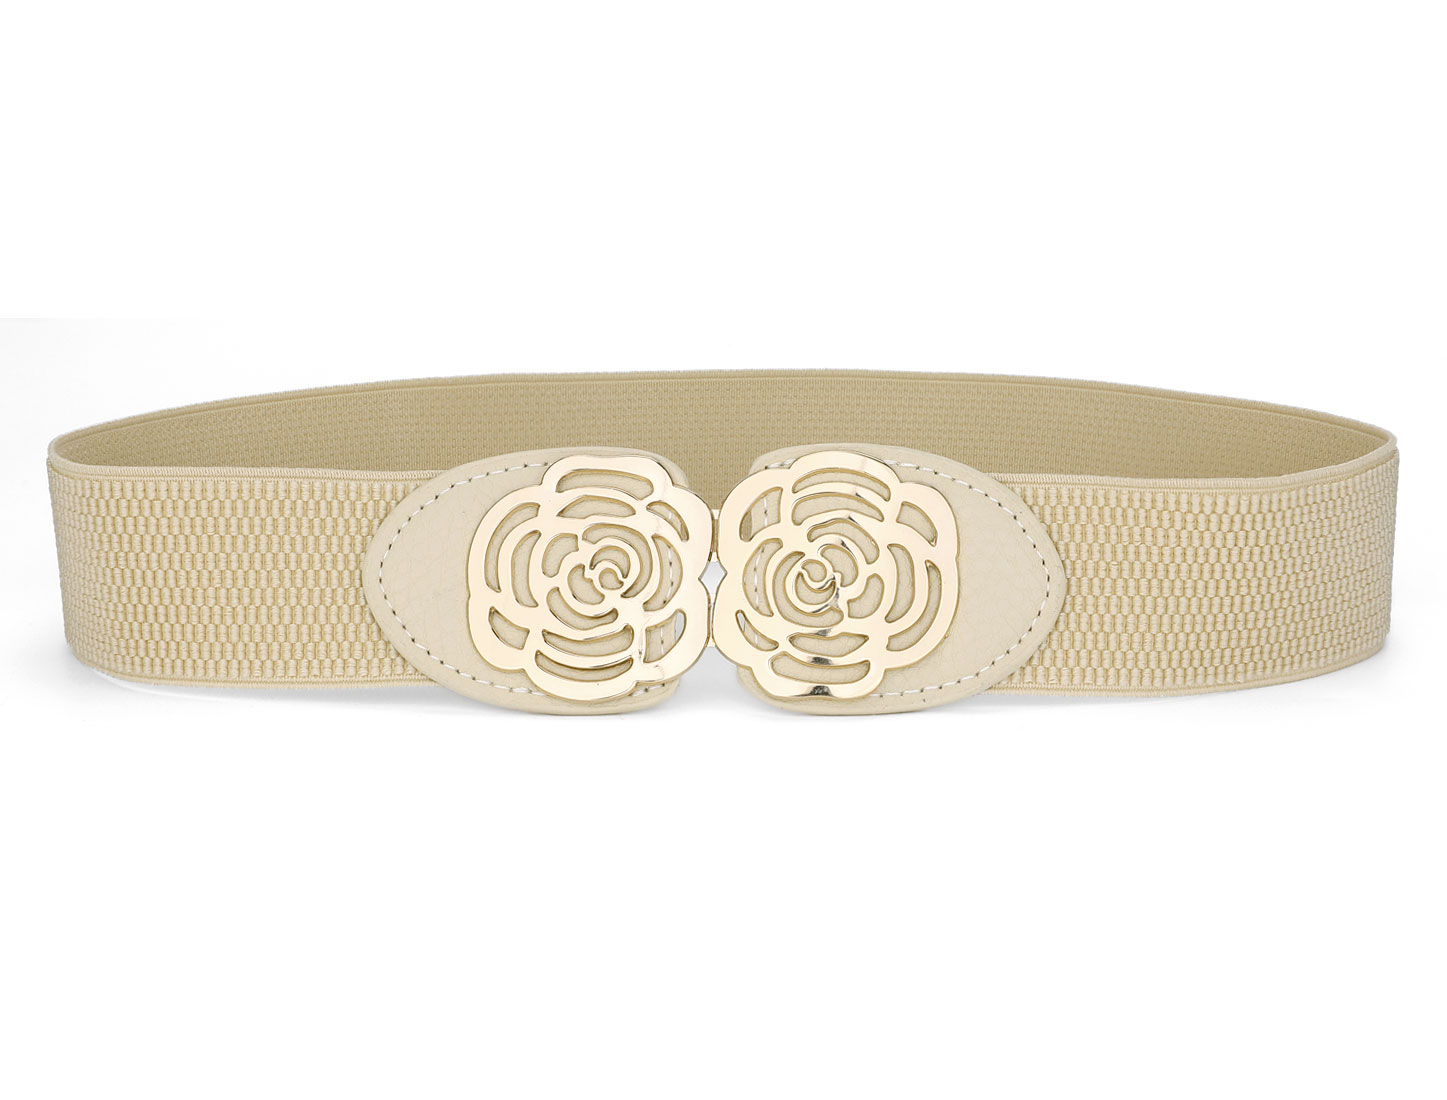 Lady Gold Tone Rose Decor Interlocking Buckle Cinch Belt Strap Beige